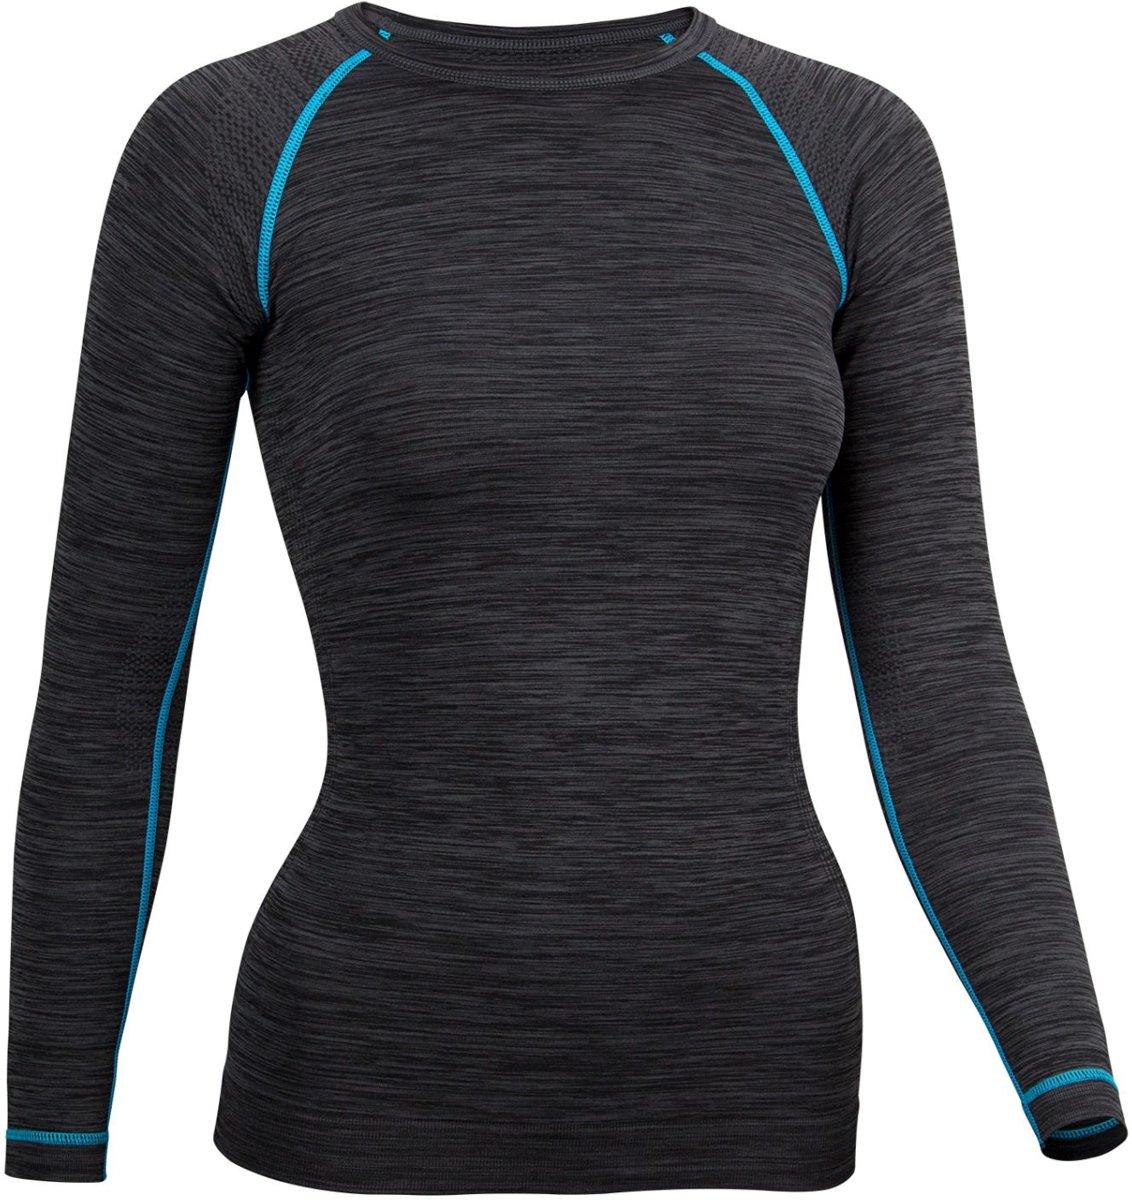 98216e996ffa4b https   www.bol.com nl p arena-glory-swim-pro-badpak-dames-blauw ...